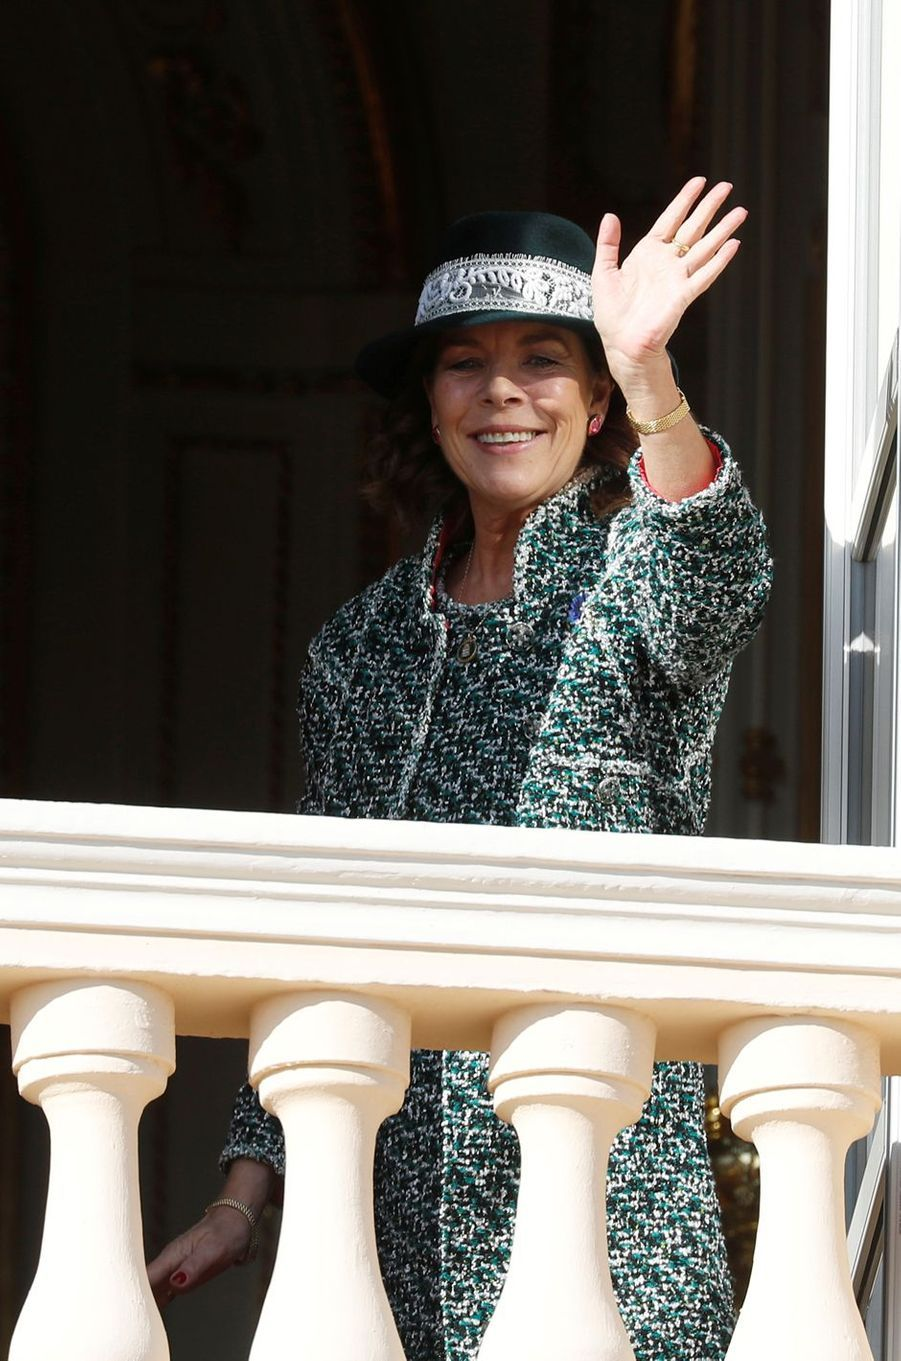 La princesse Caroline de Hanovre à Monaco, le 19 novembre 2018